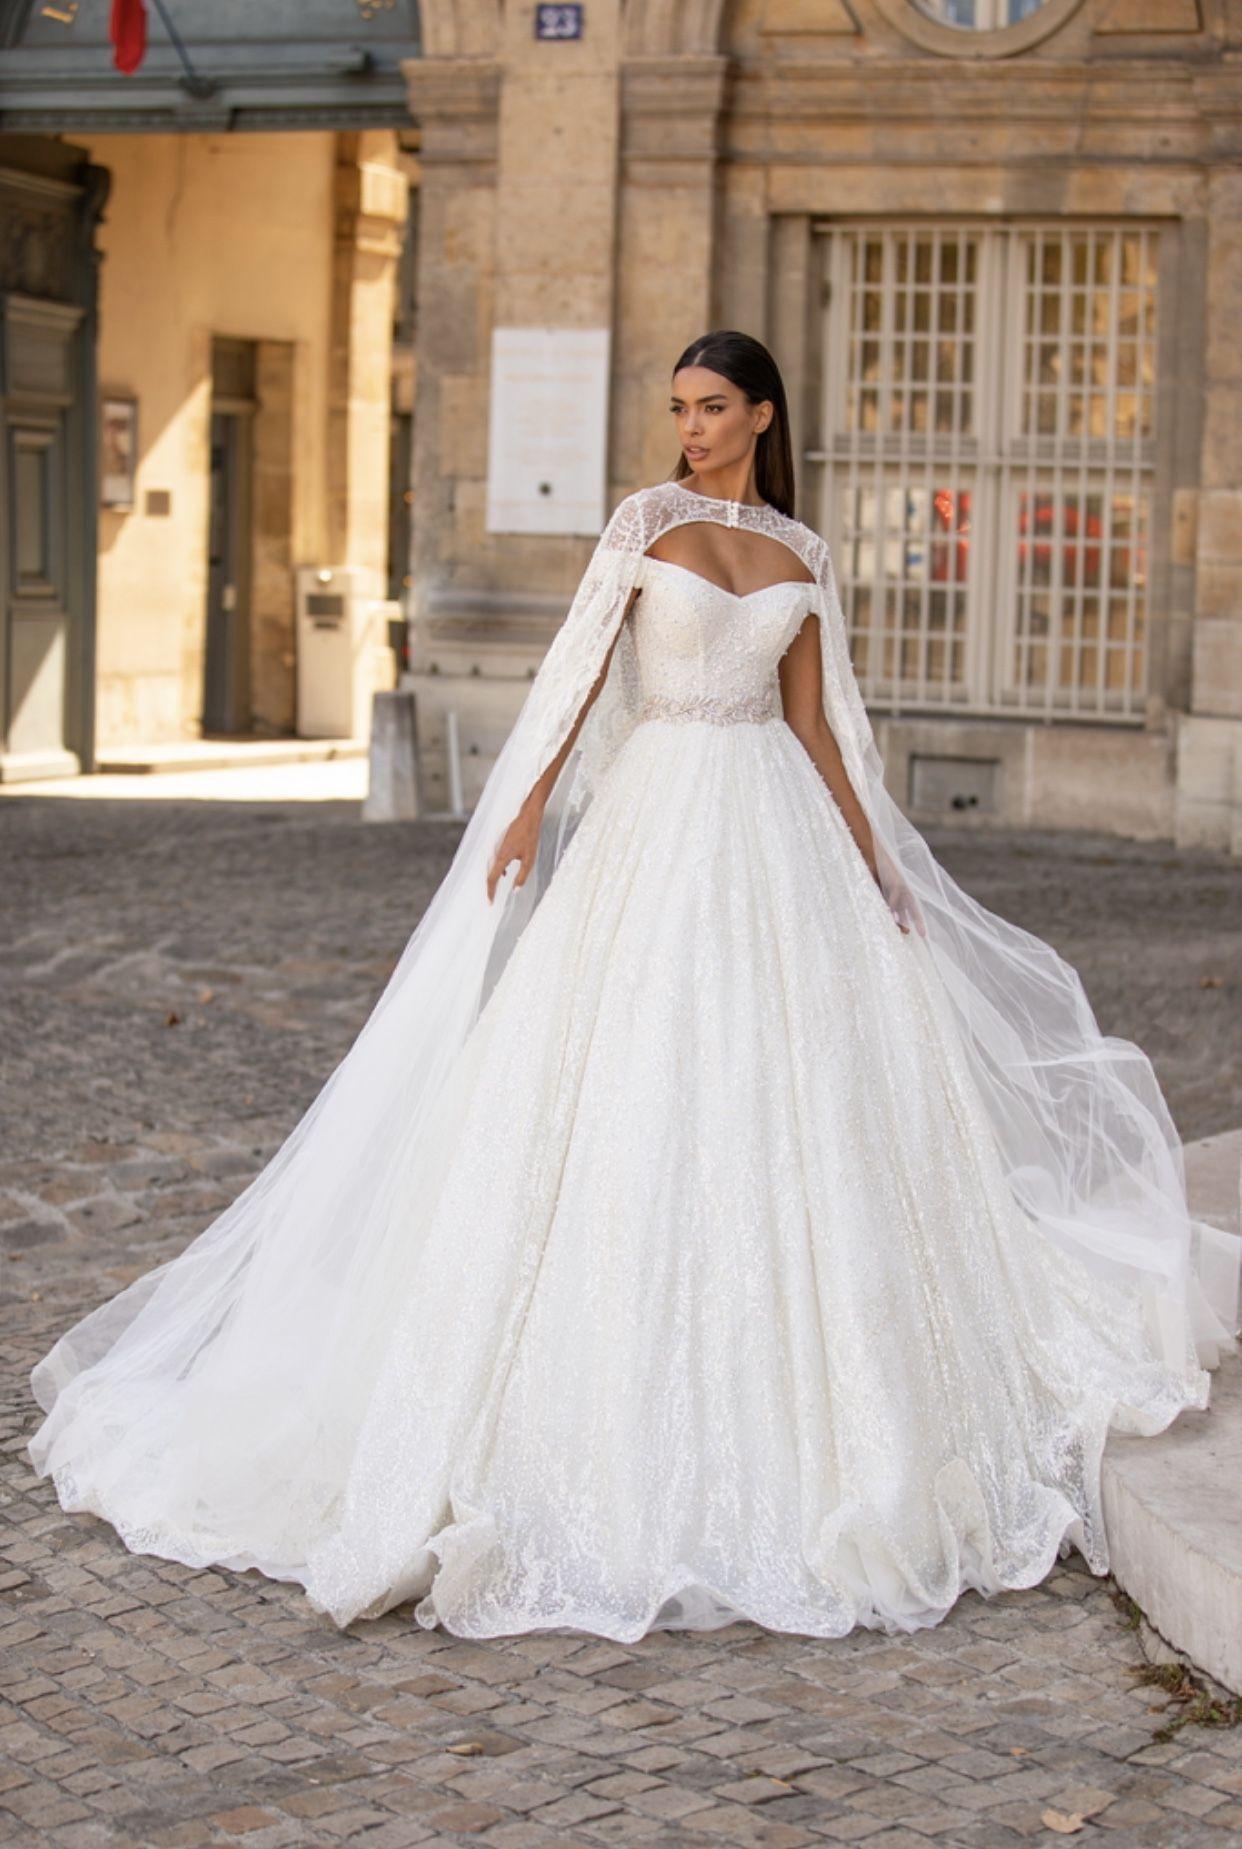 Wedding Dress From Milla Nova Cape Wedding Dress Boho Chic Wedding Dress Ball Gowns Wedding